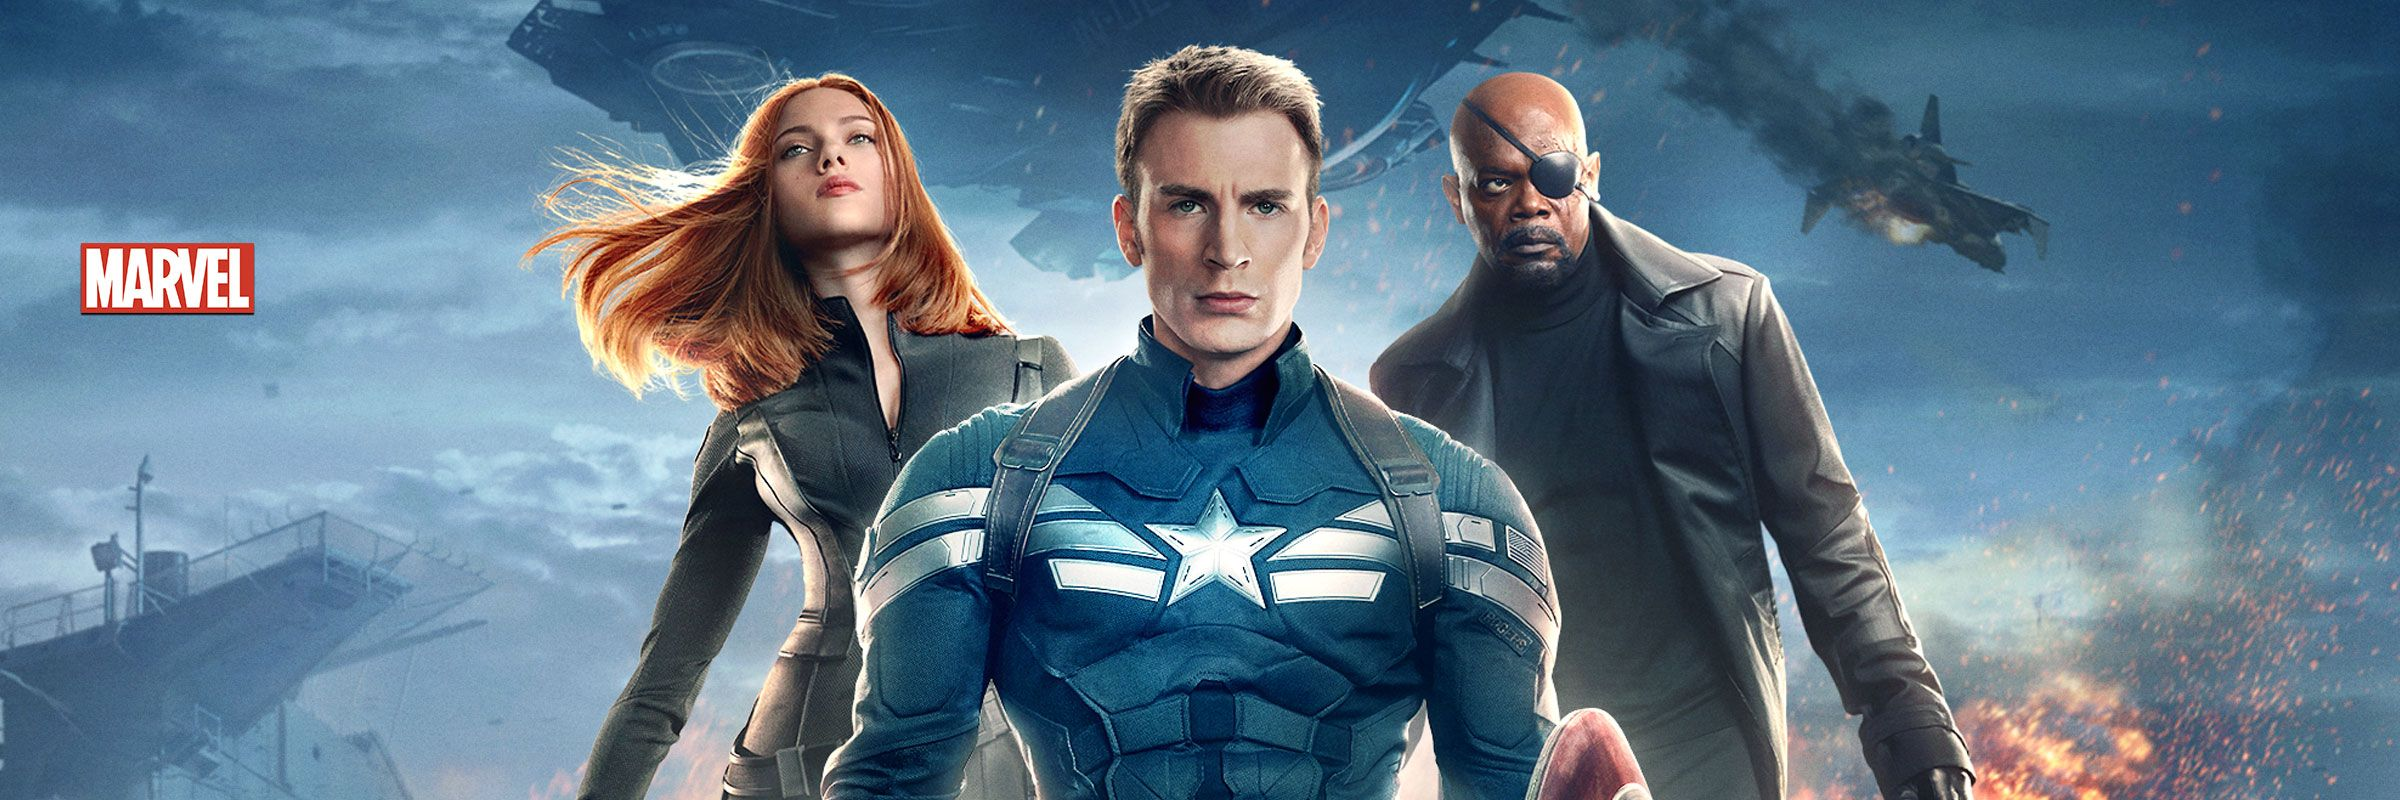 Marvel Studios' Captain America: The Winter Soldier   Full Movie